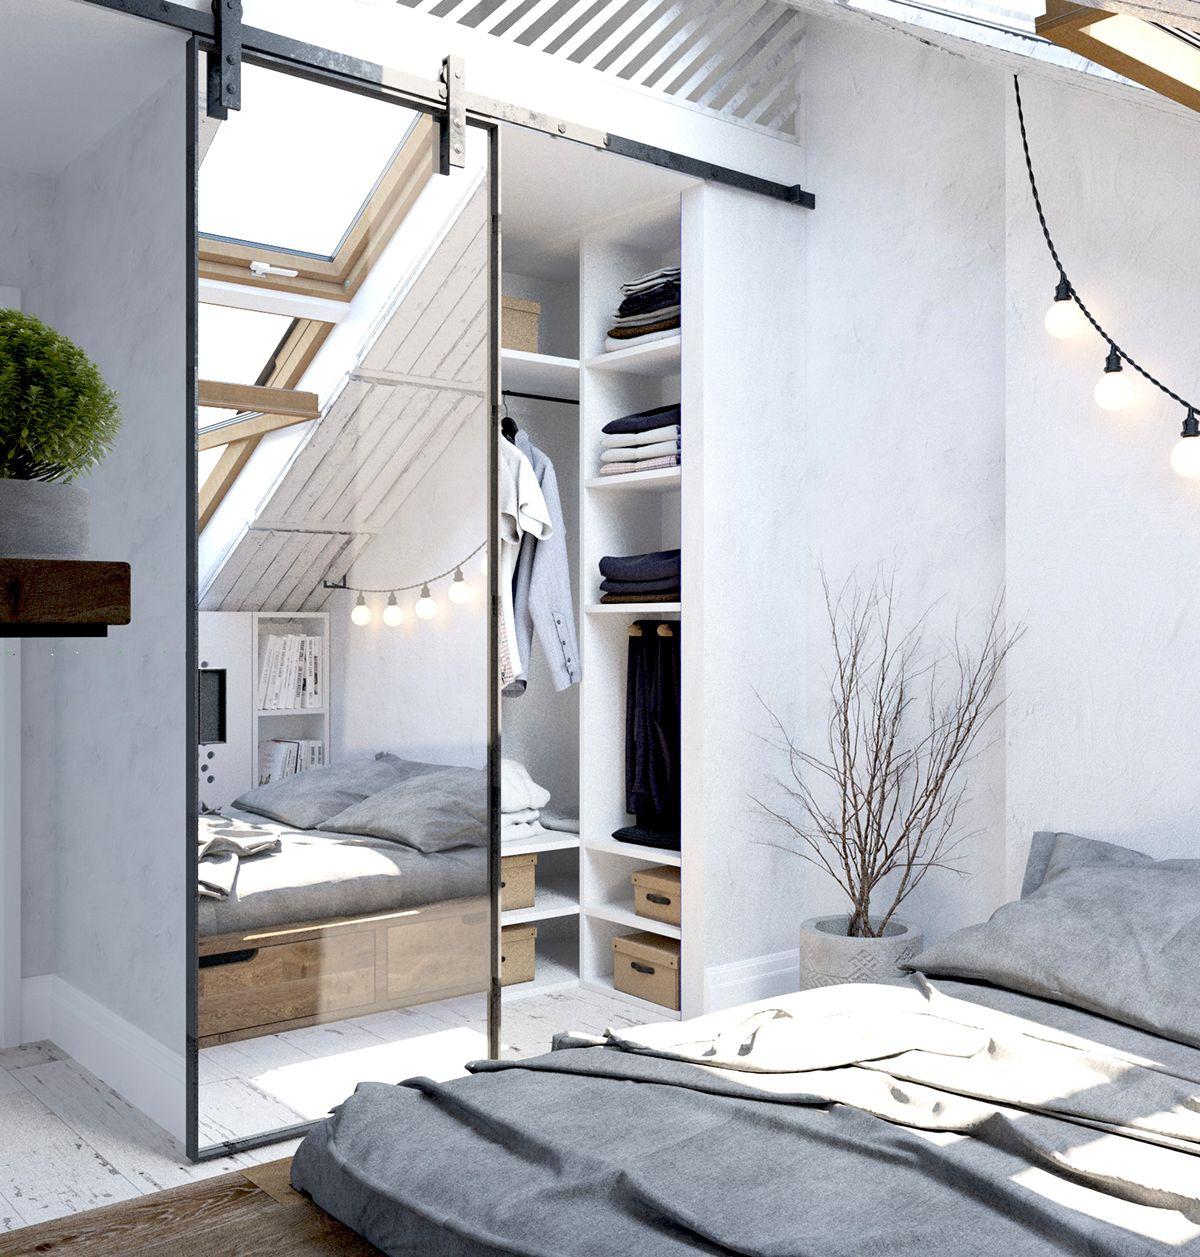 Loft bed privacy ideas  mansard bedroom in Scandinavian style Lauri bros  Wardrobe ideas